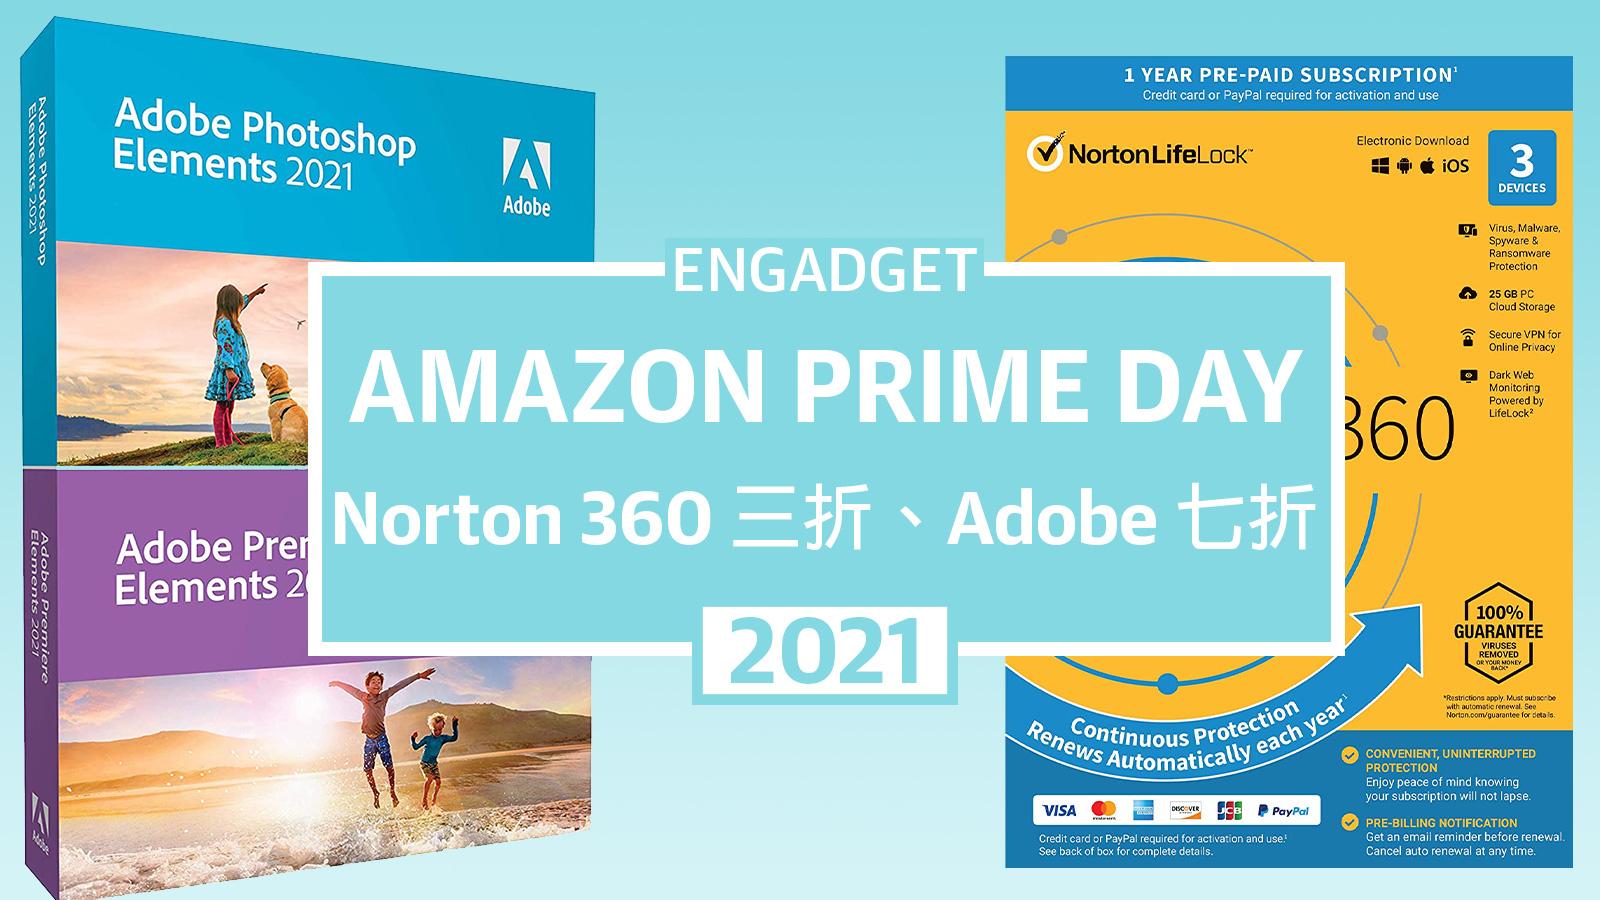 Amazon Prime Day 2021 subscription